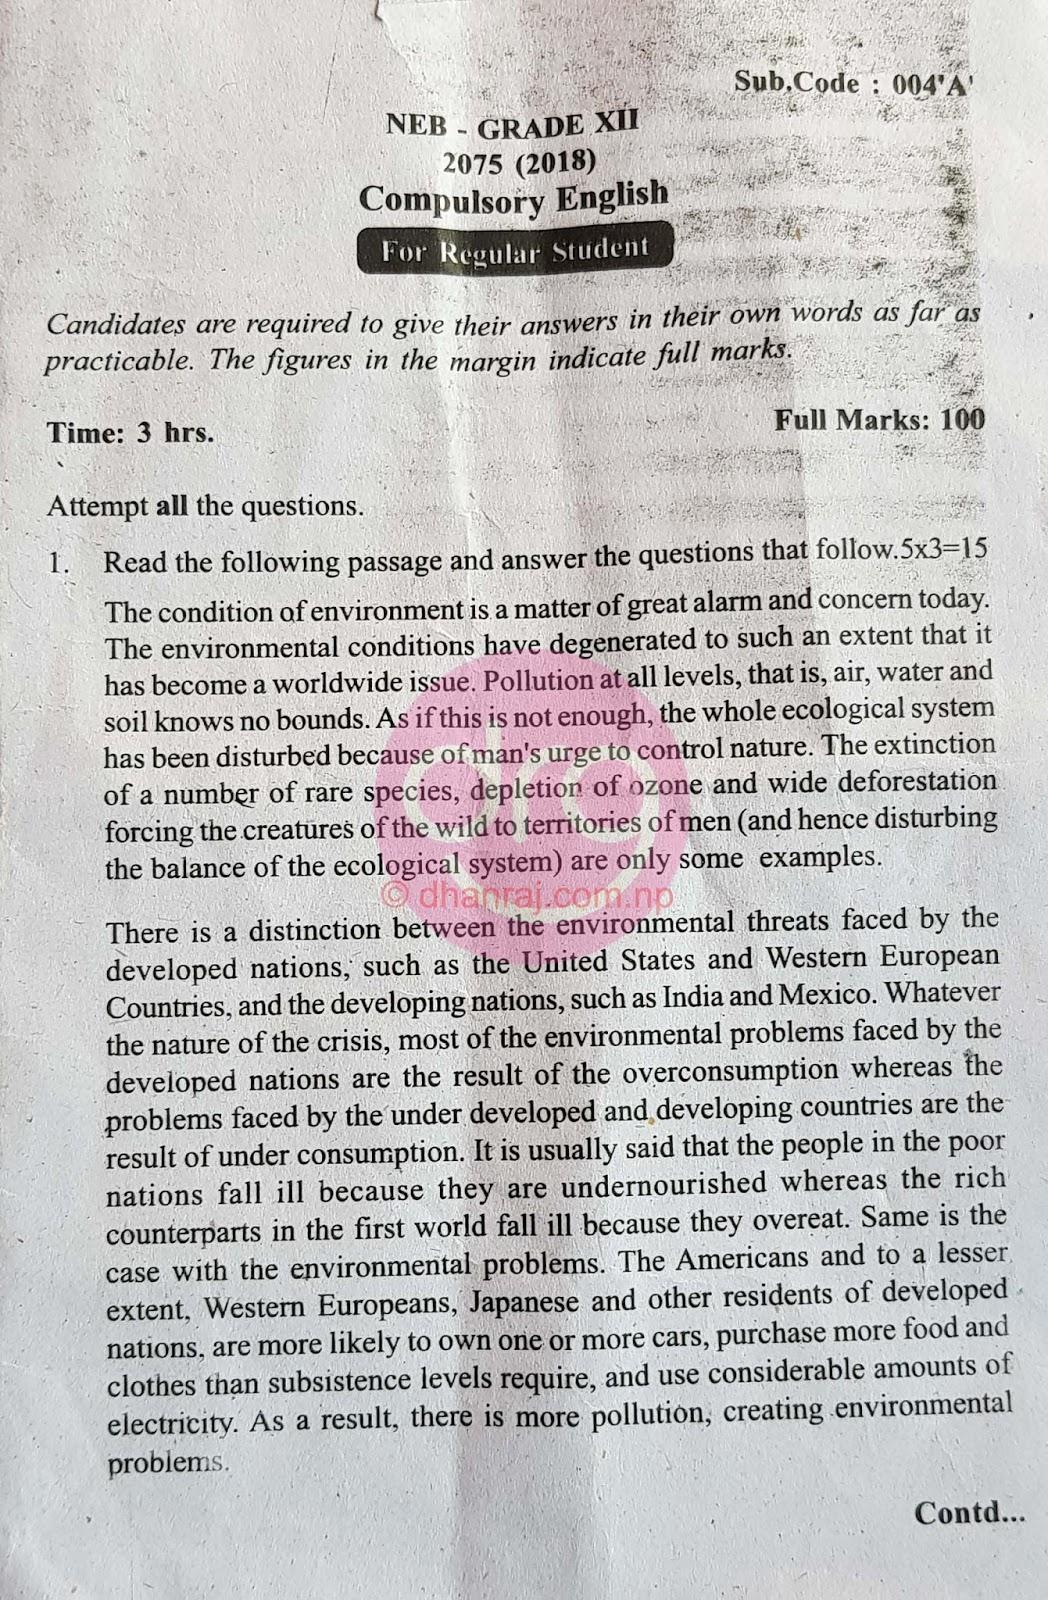 Compulsory English | Class 12 | Exam Paper 2075 [2018